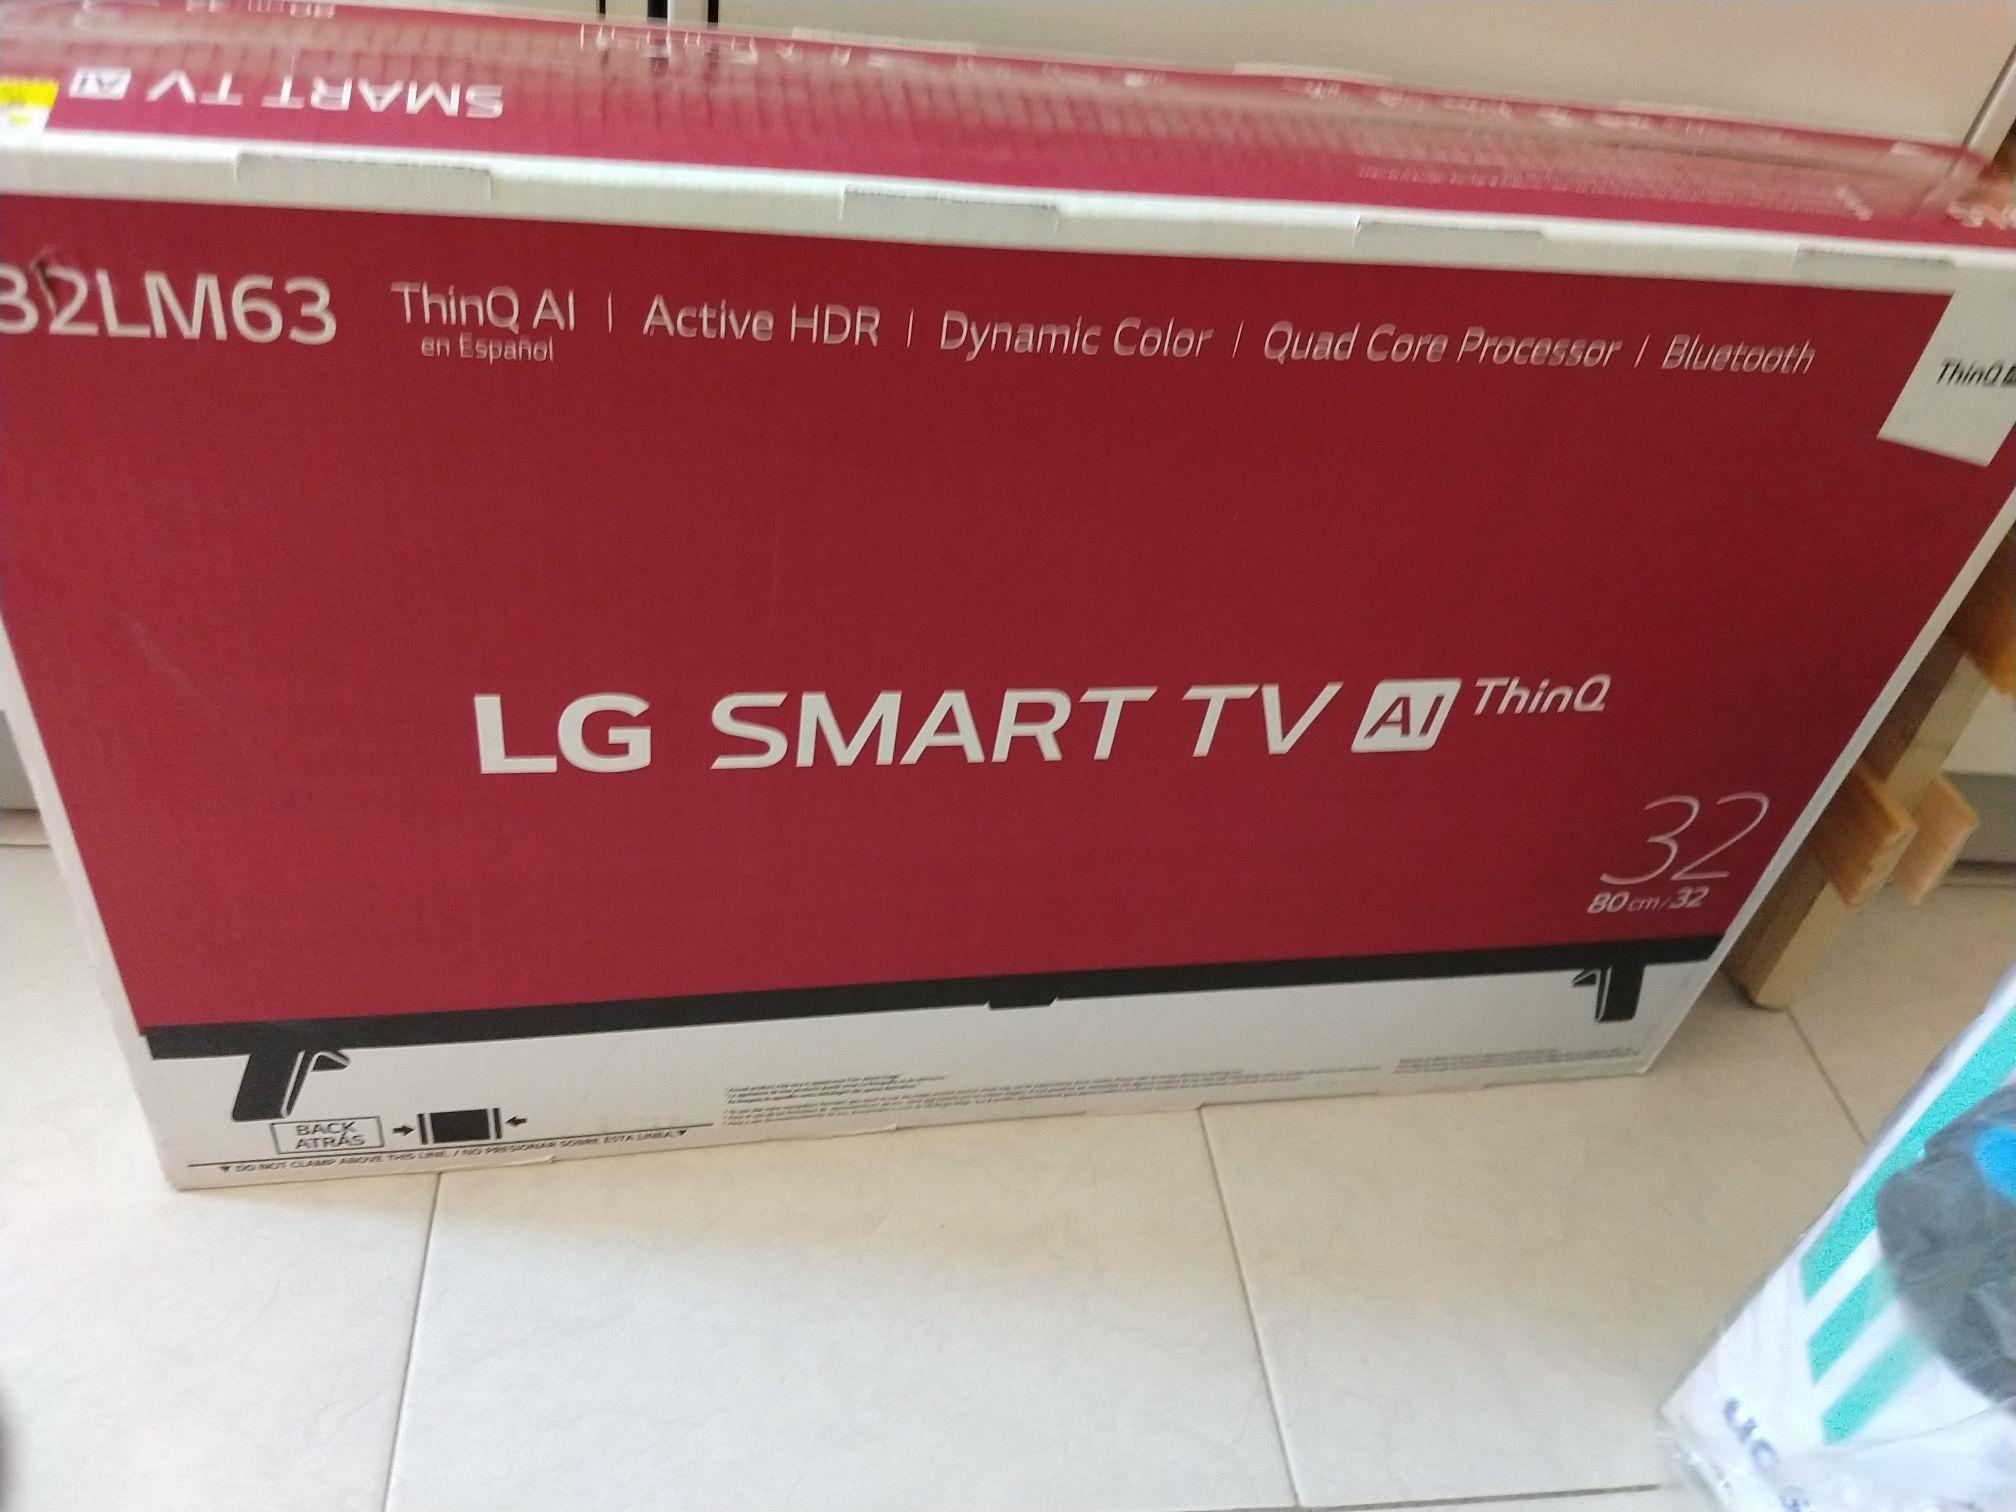 Walmart Vía Alta SMART TV LG 32 pulgadas